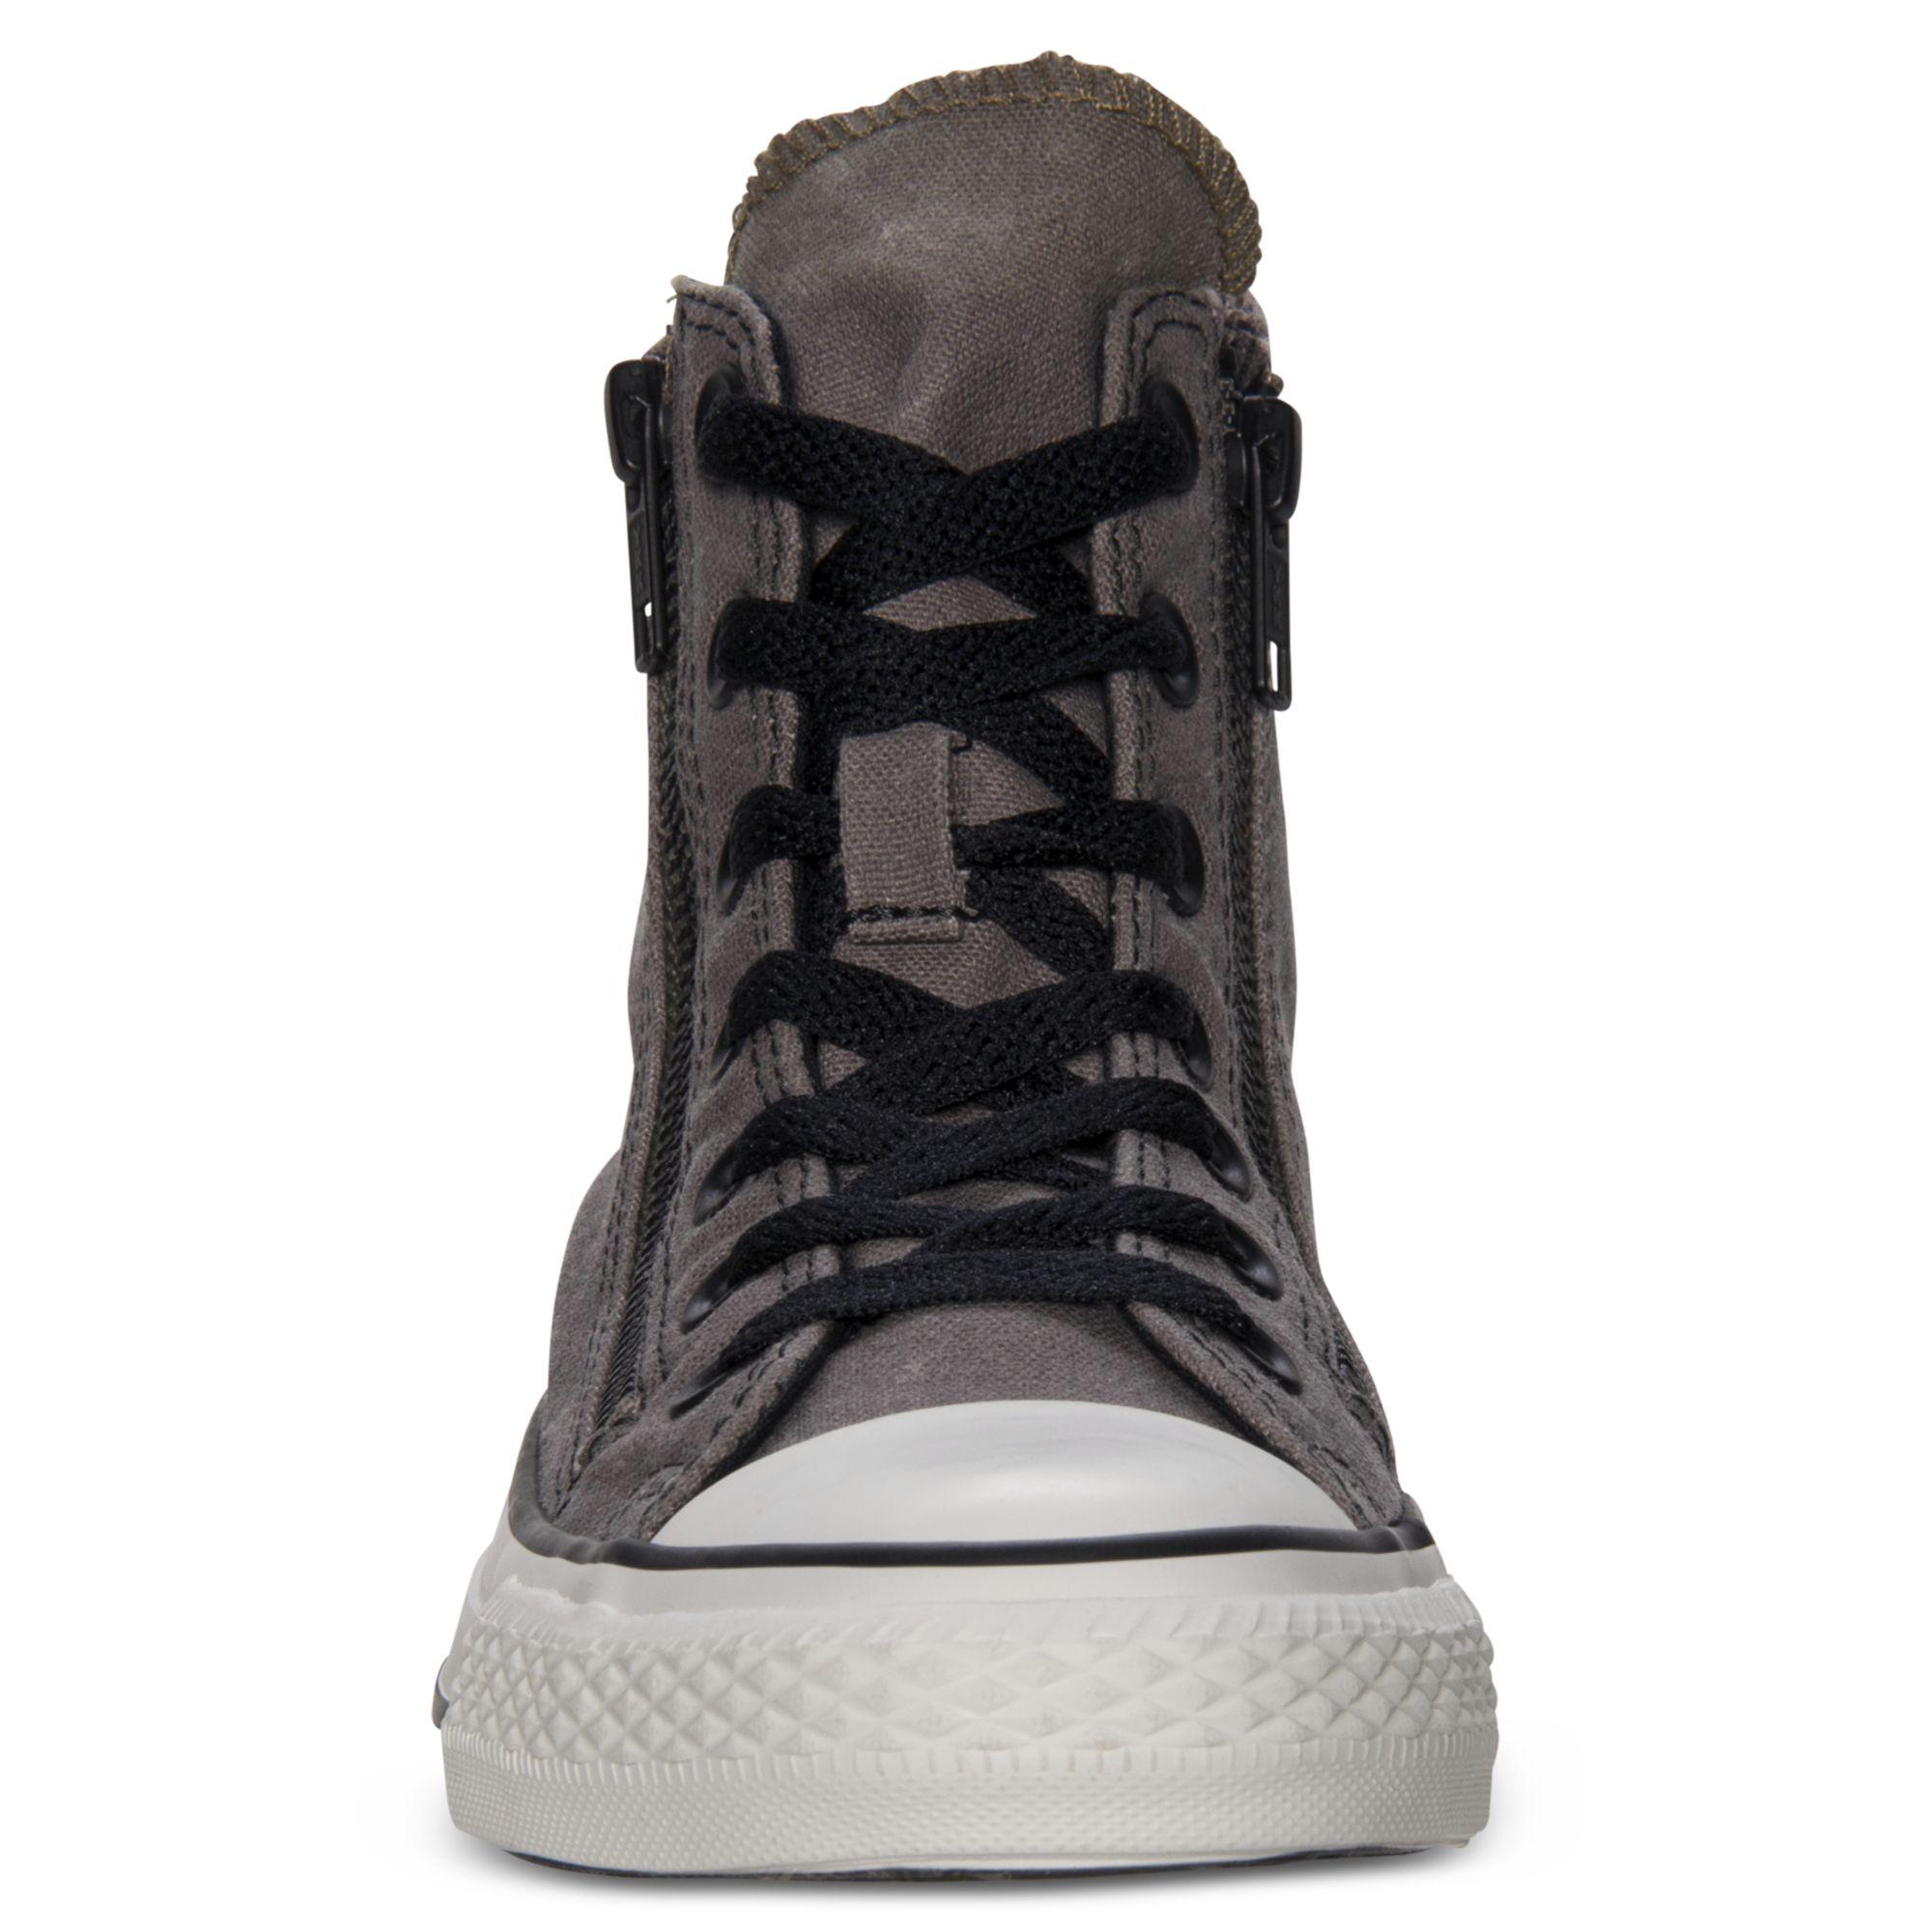 Converse Sneakers Mens - Converse Chuck Taylor All Star Double Zip Hi Purple